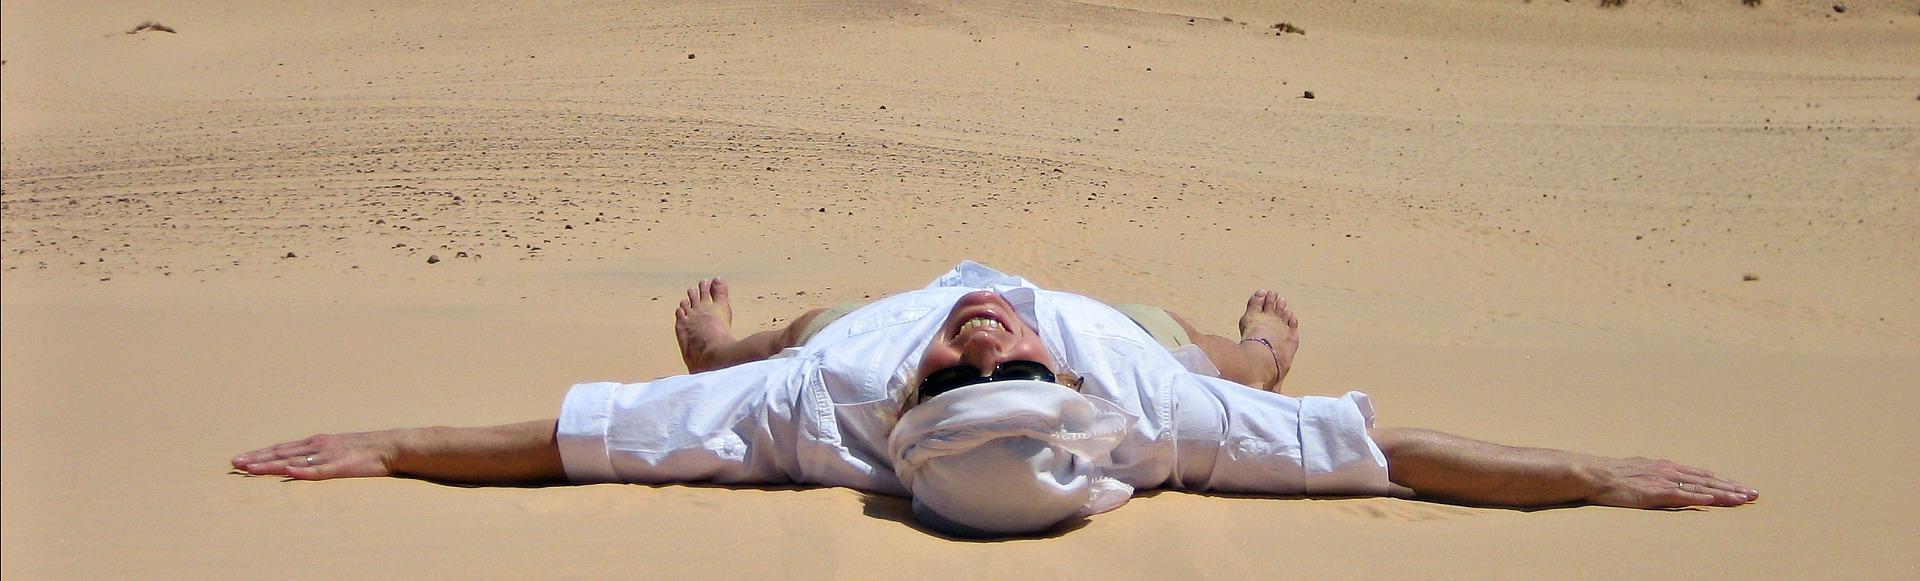 DesertJoy, Nomadisch reizen